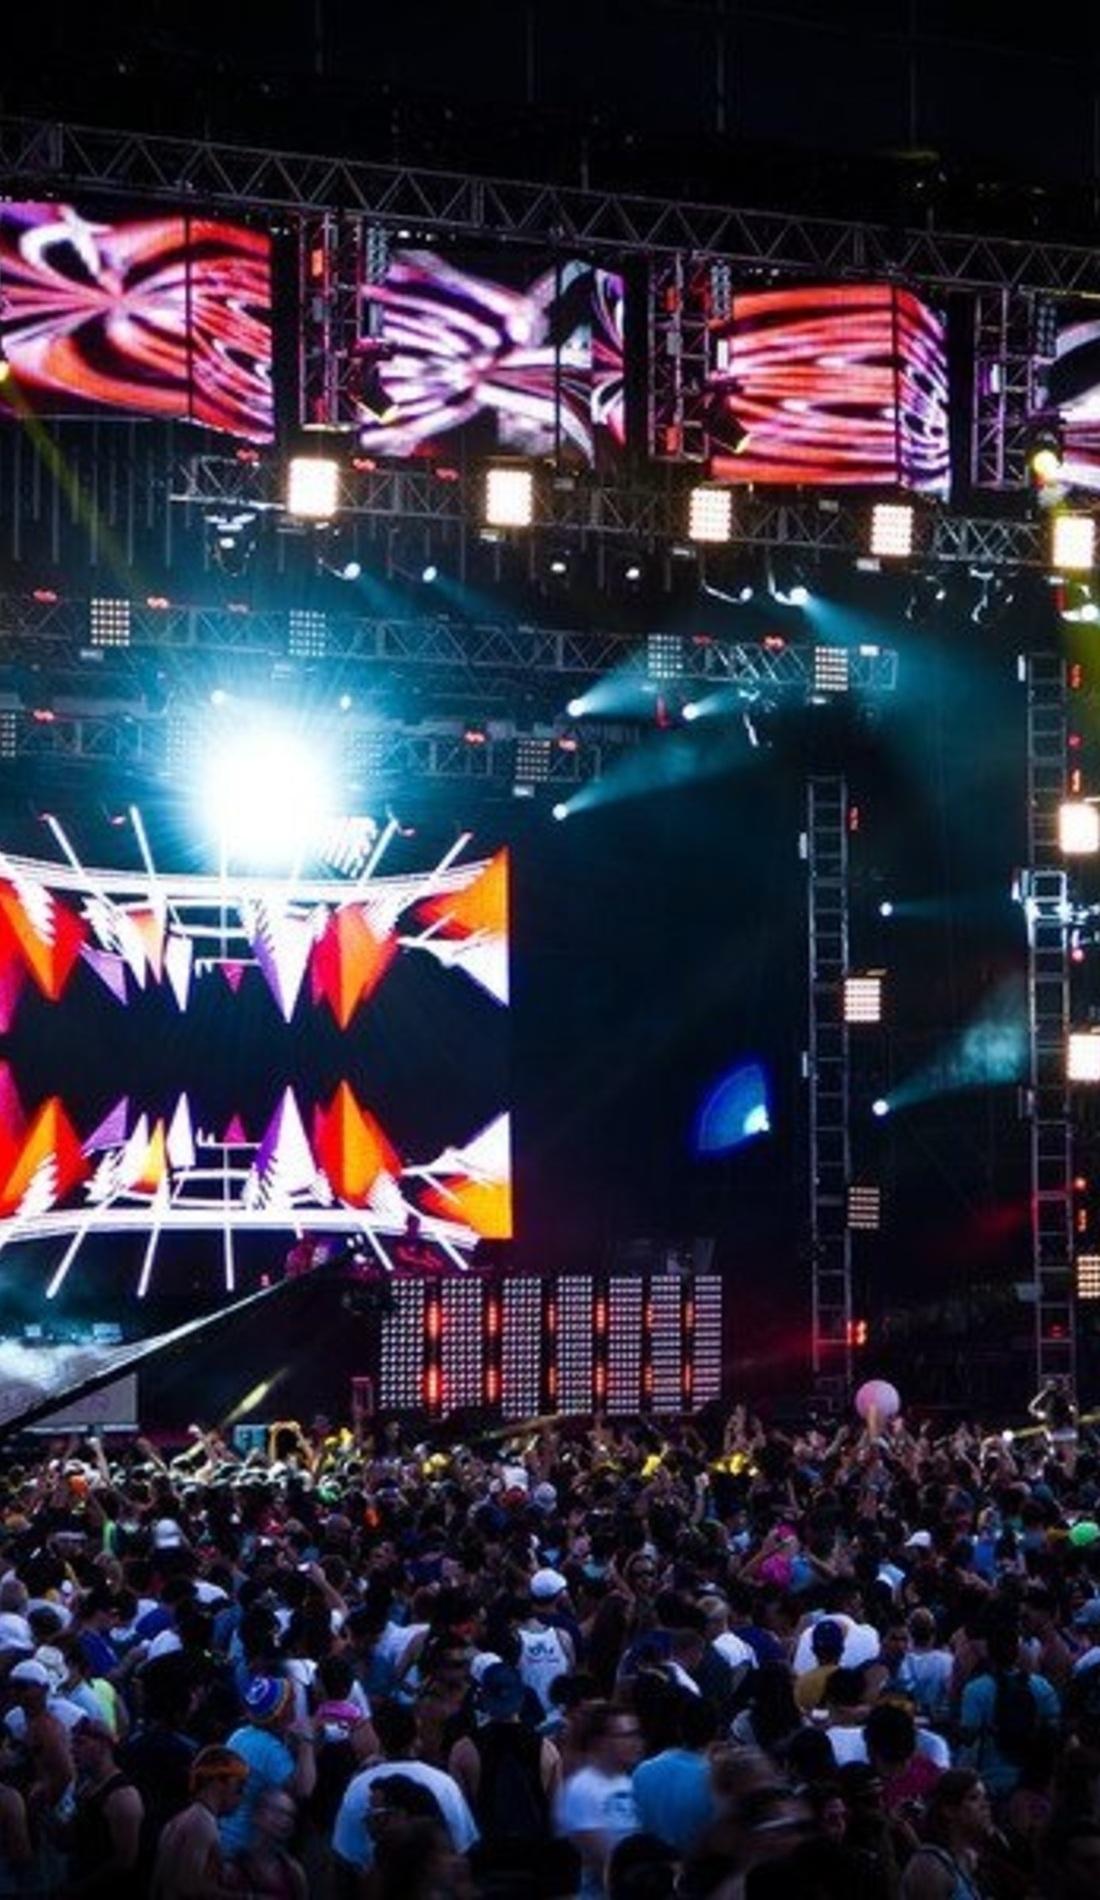 A Ultra Music Festival live event